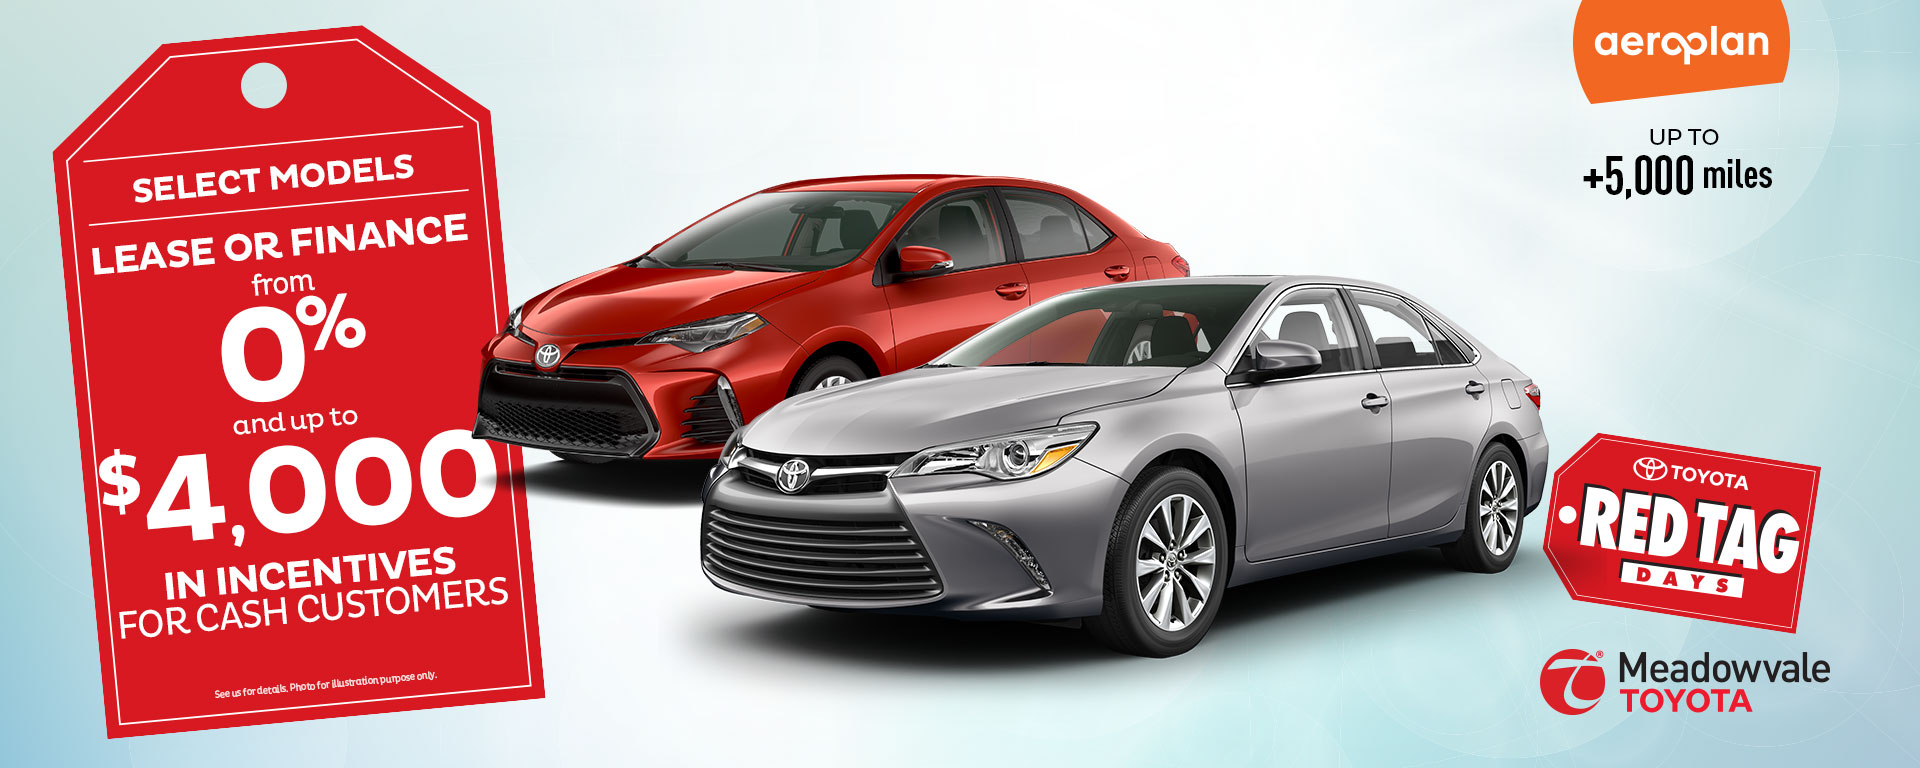 Meadowvale Toyota Used Cars